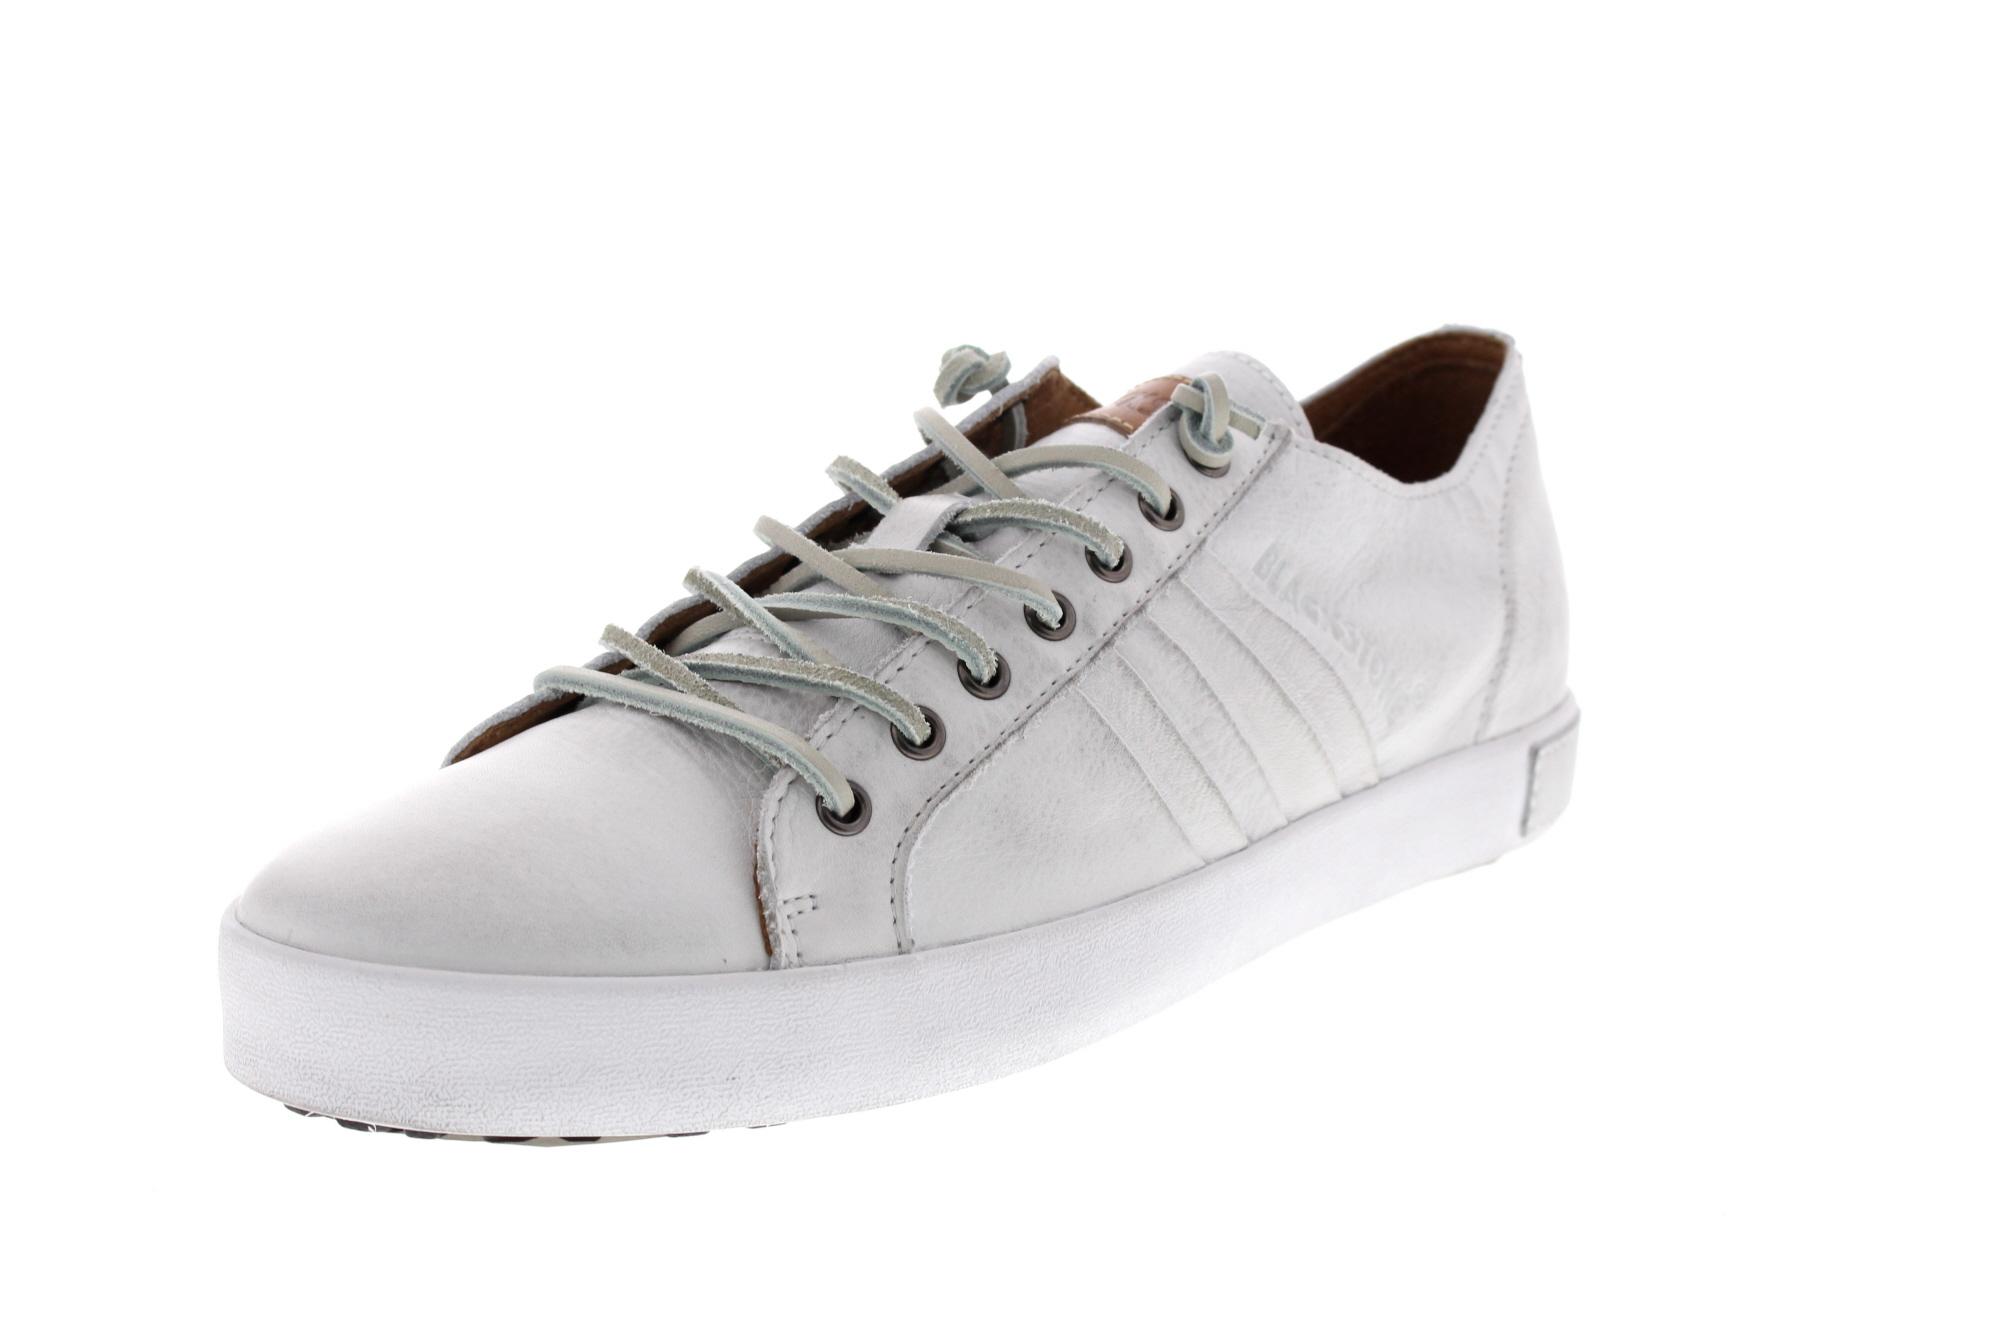 BLACKSTONE Herrenschuhe - Sneakers JM11 - white _0